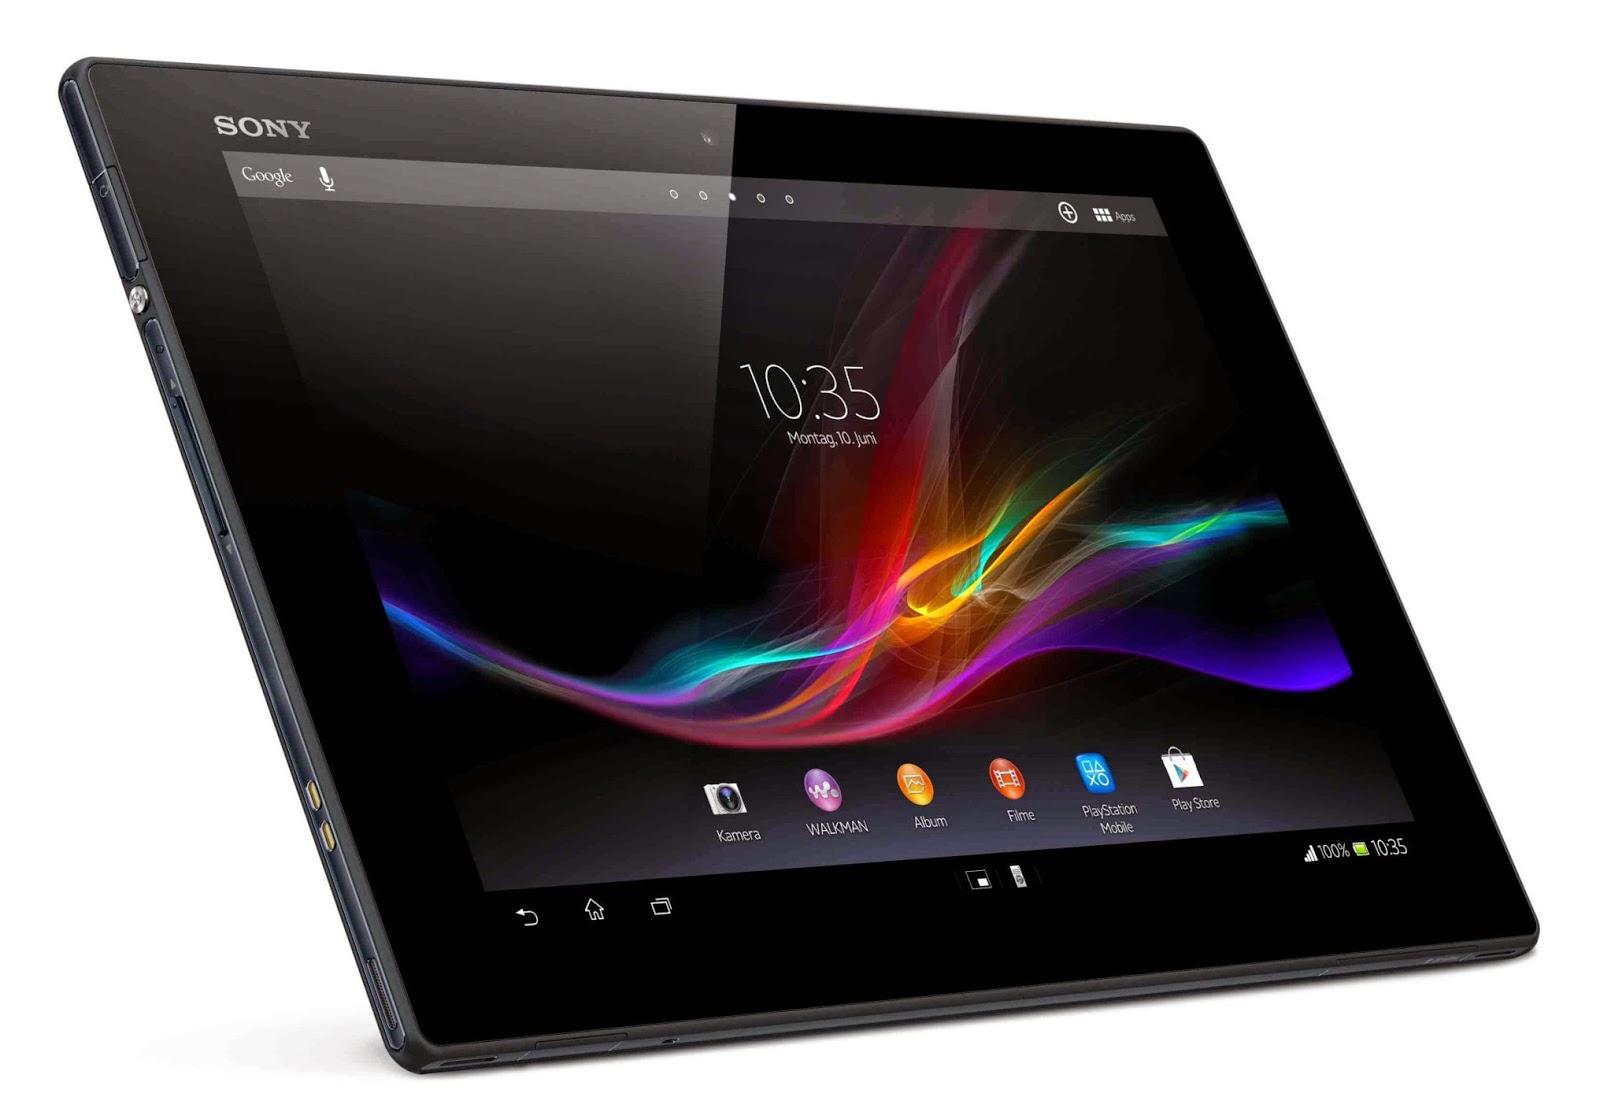 2014 Media Info Imo Turbo 2gb Ram 32 Rom 13mp5mp 15ghz Quad Core Sony Xperia Z4 Tablet Ultra Dengan Layar 129 Inci Dan 6gb